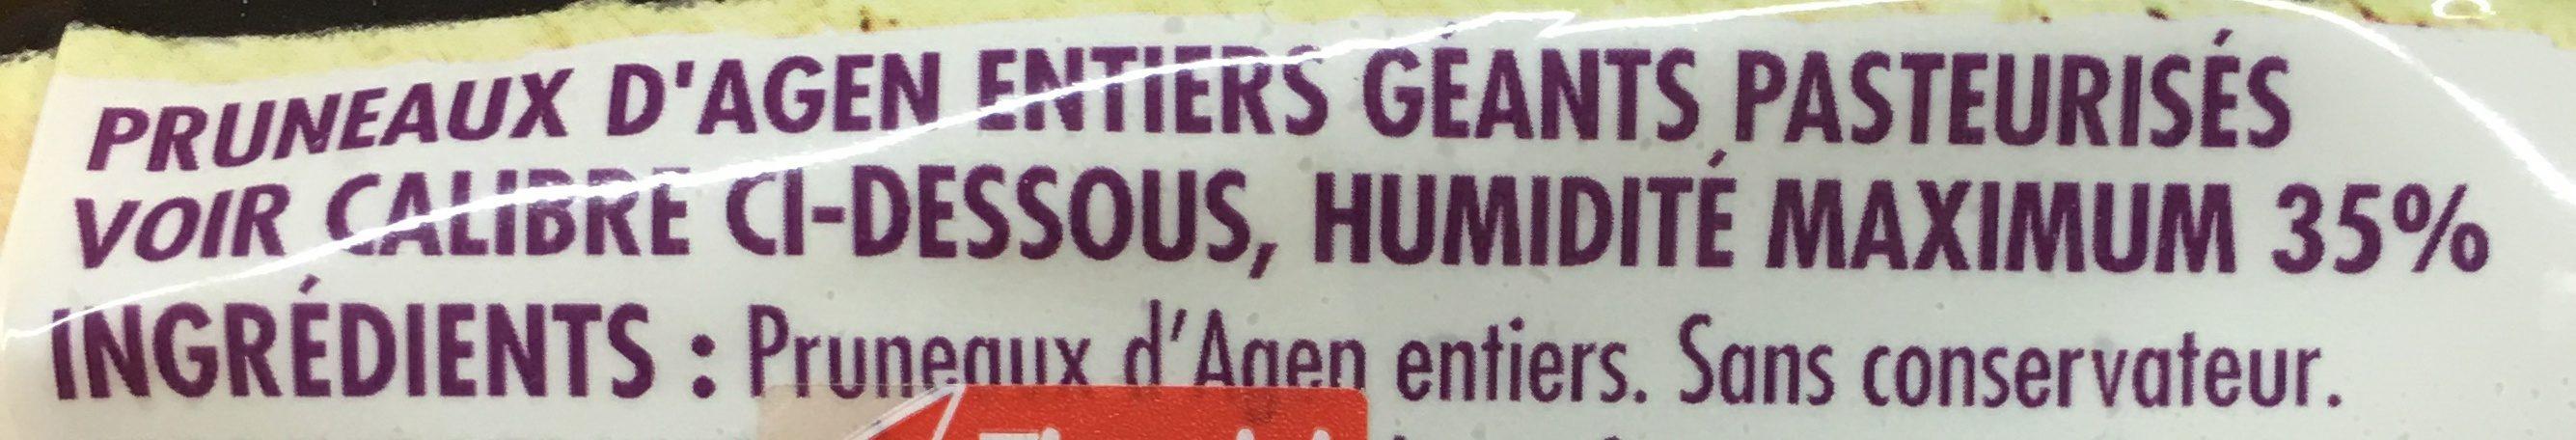 Pruneaux d'agen geant entiers ids - Ingredientes - fr